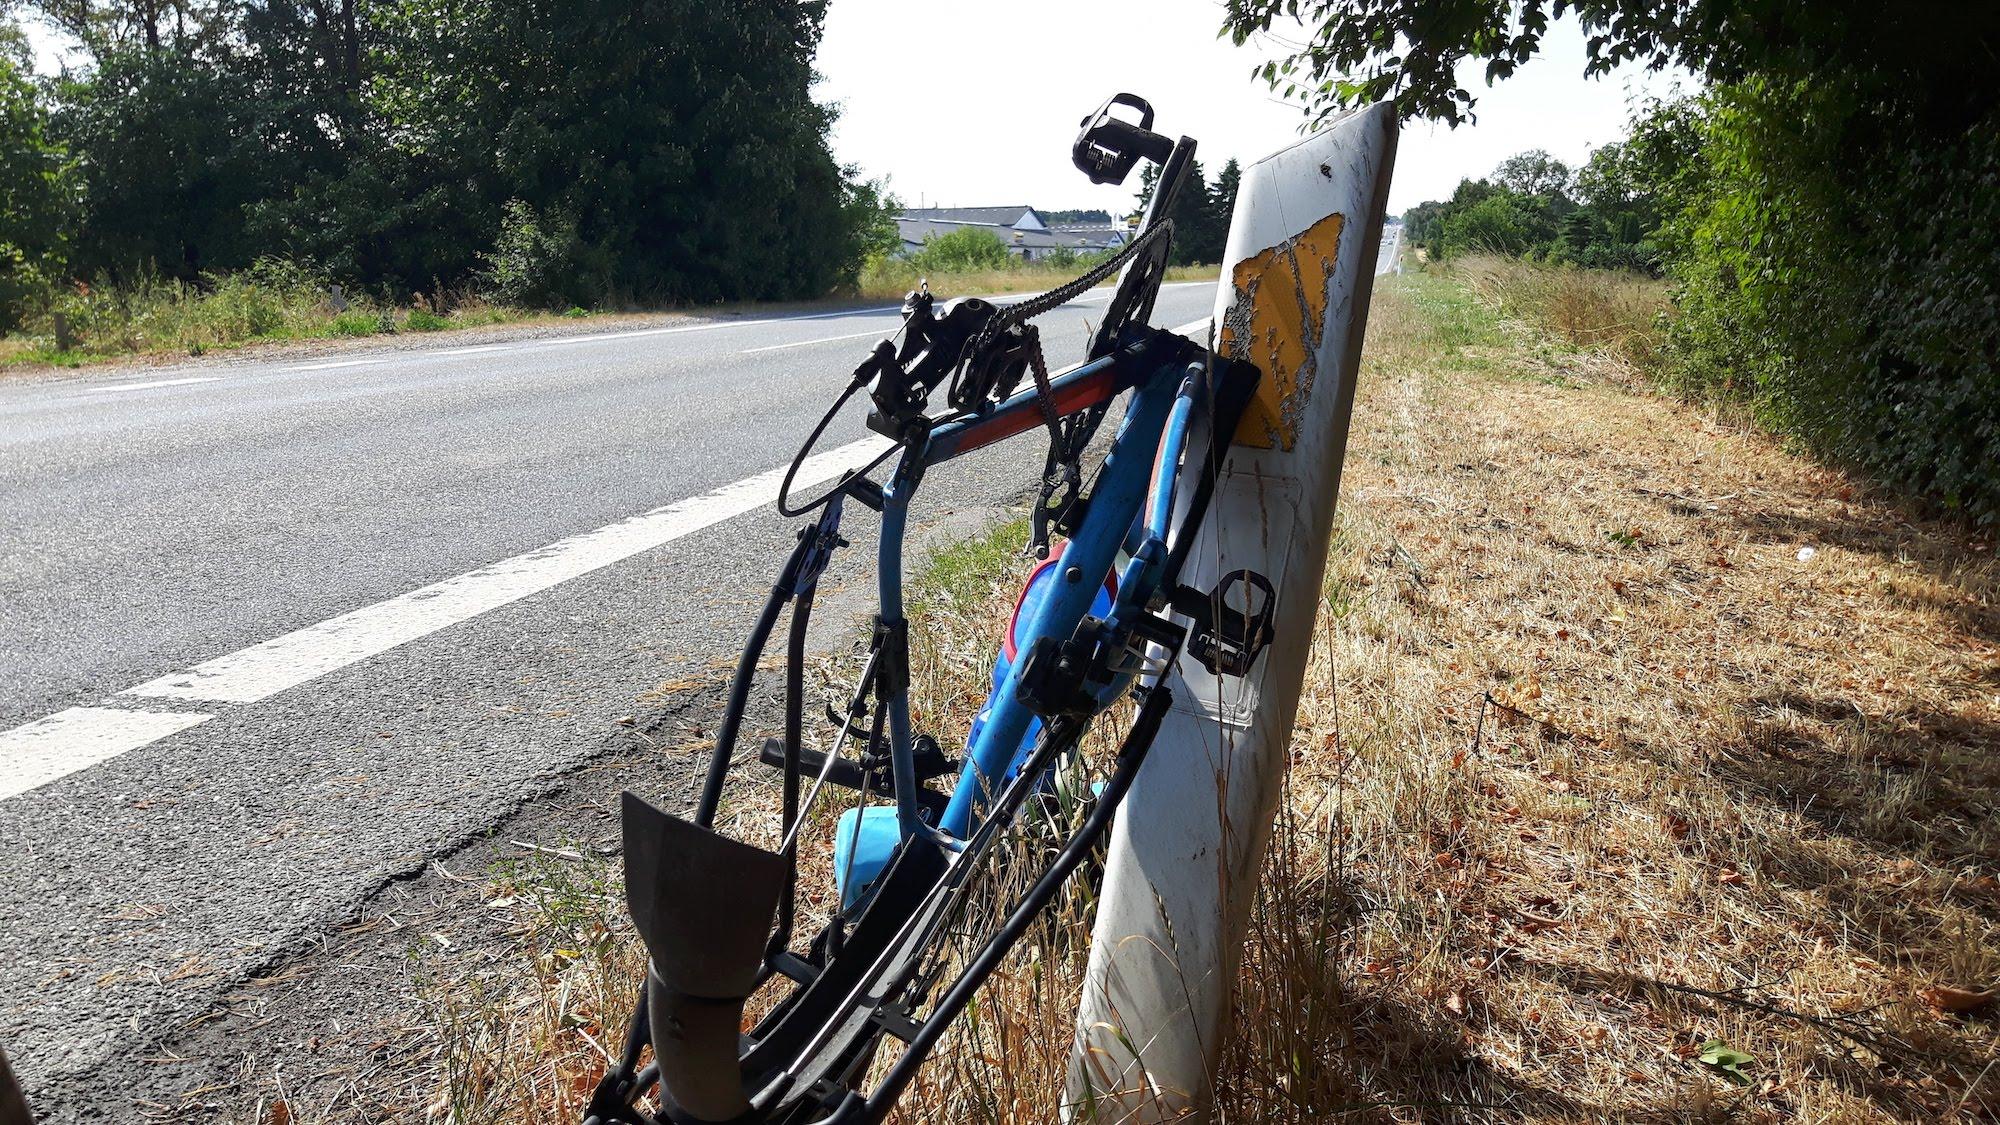 Bicycle along road